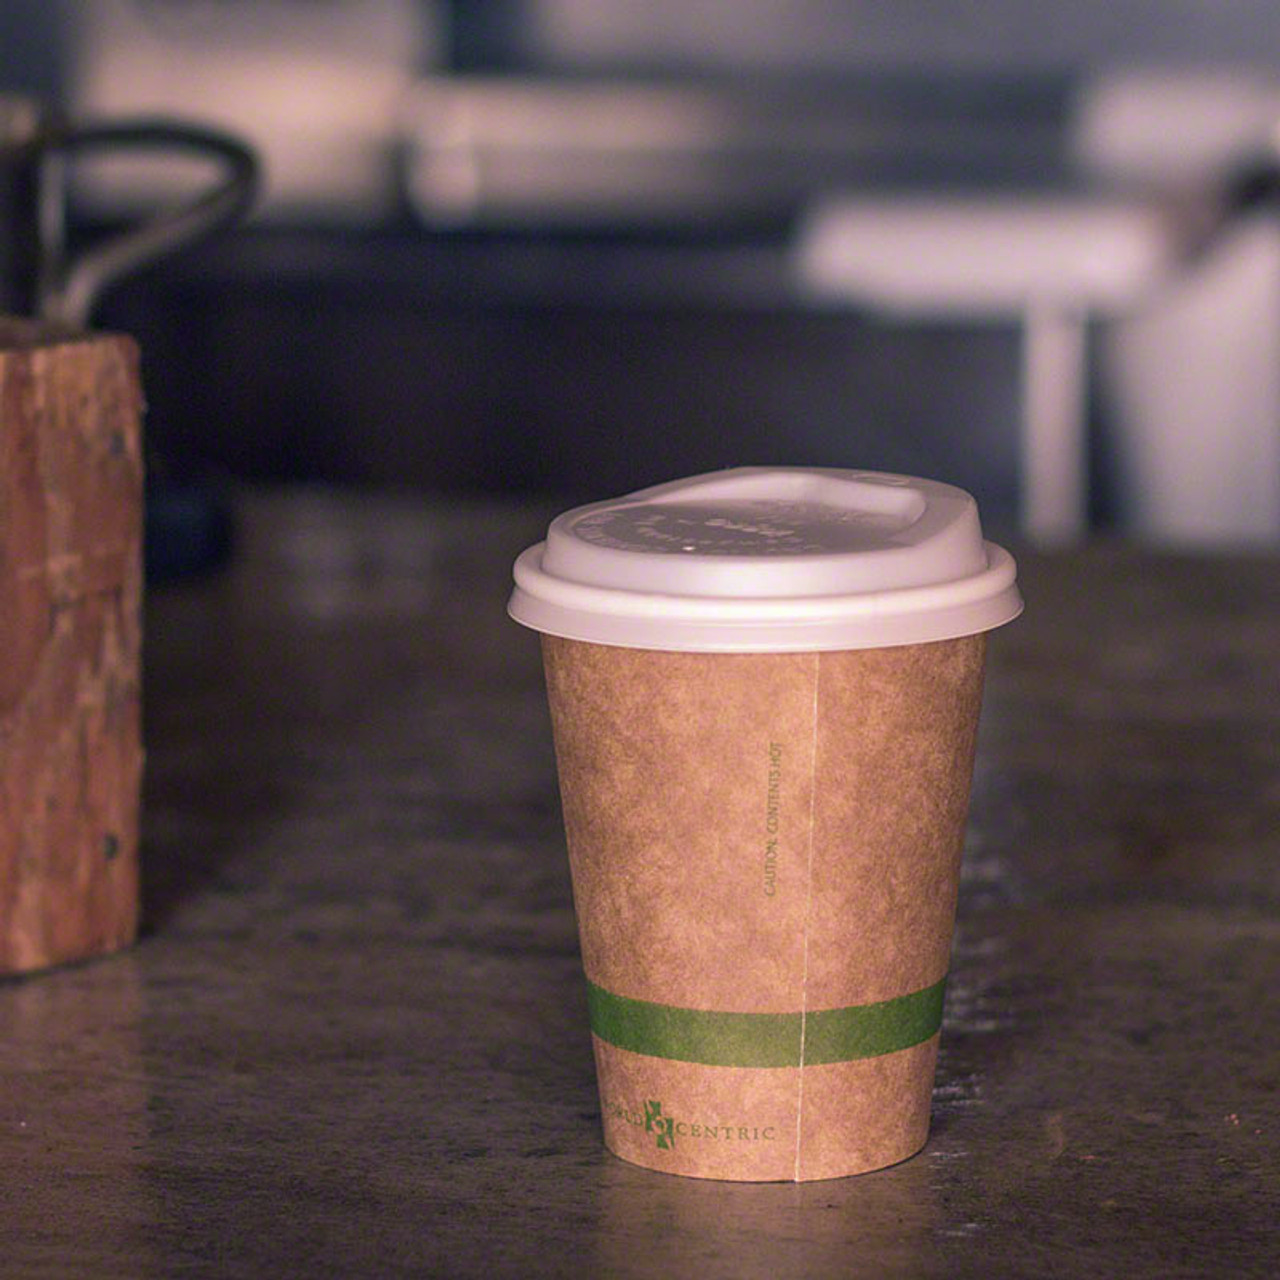 8 oz Compostable Kraft Paper Cup   Biodegradable